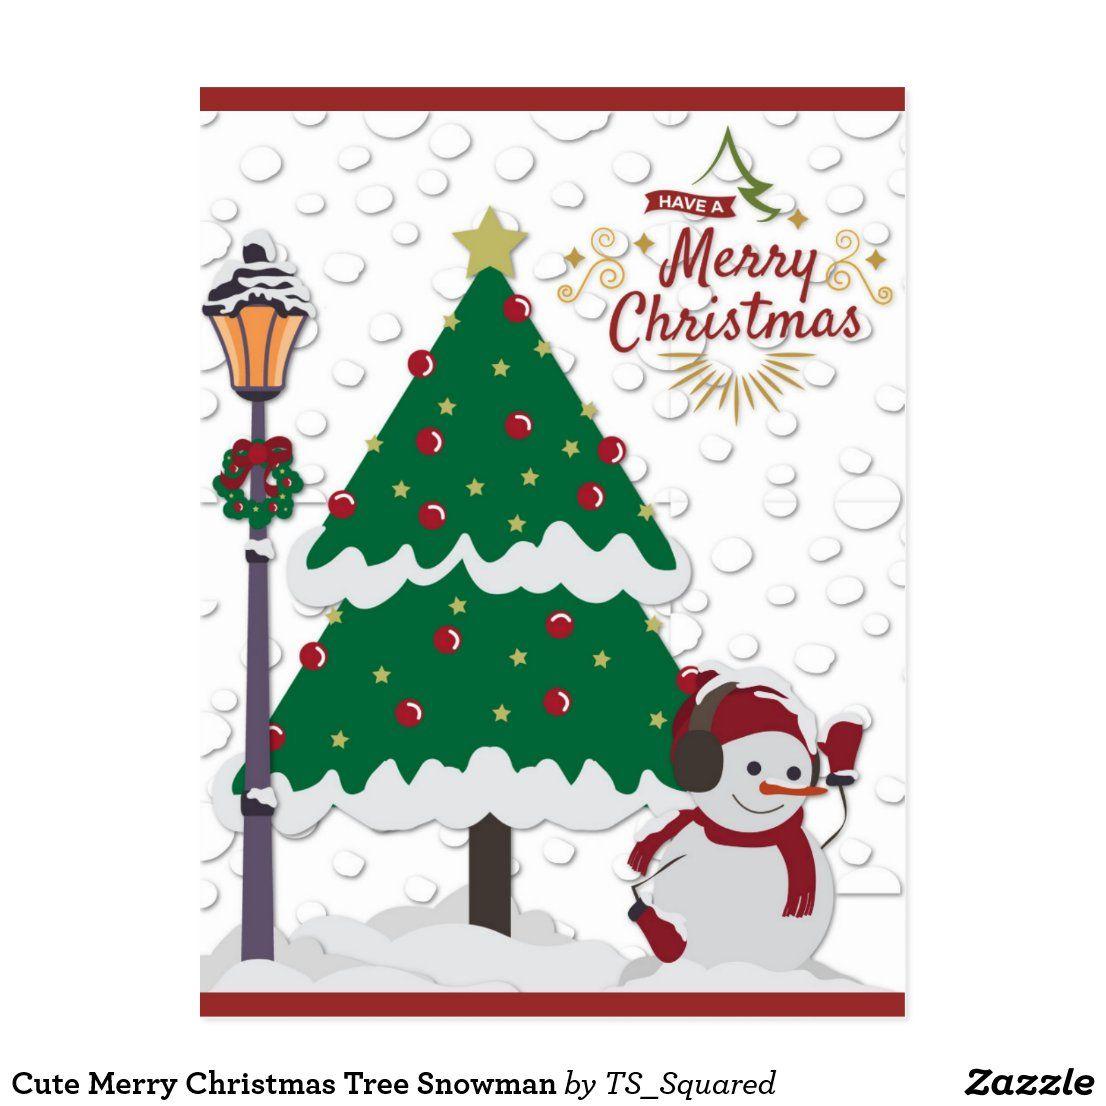 Cute Merry Christmas Tree Snowman Postcard Zazzle Com Merry Christmas Custom Holiday Card Christmas Tree